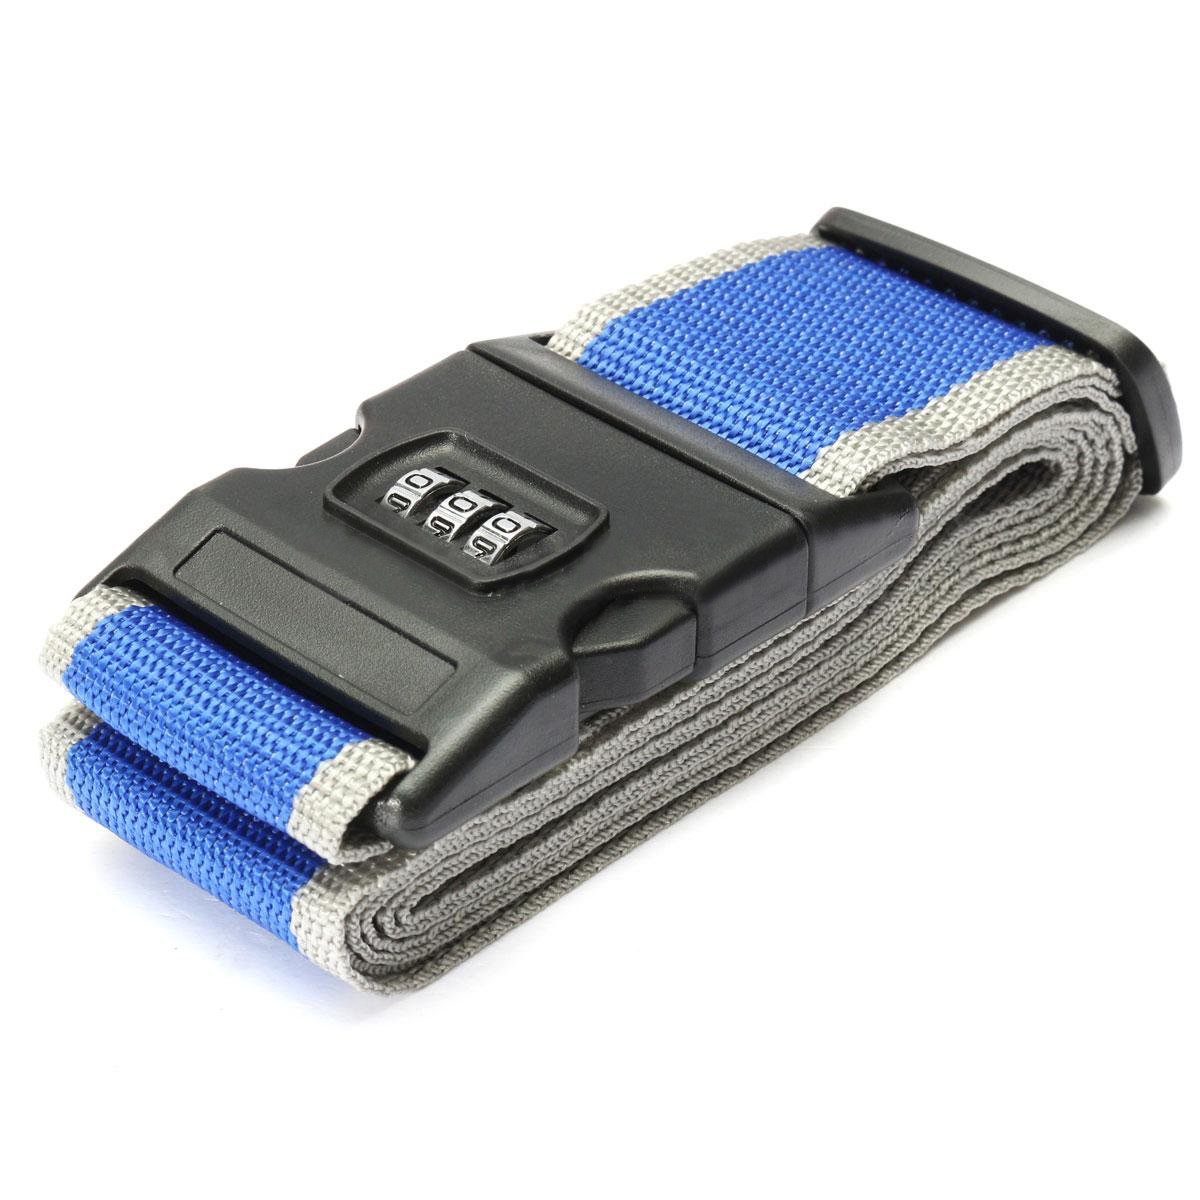 Luggage belt strape Safety Belt Lock Combination Travel Luggage Suitcase band bichi belt leg band combination does not contain light bulbs